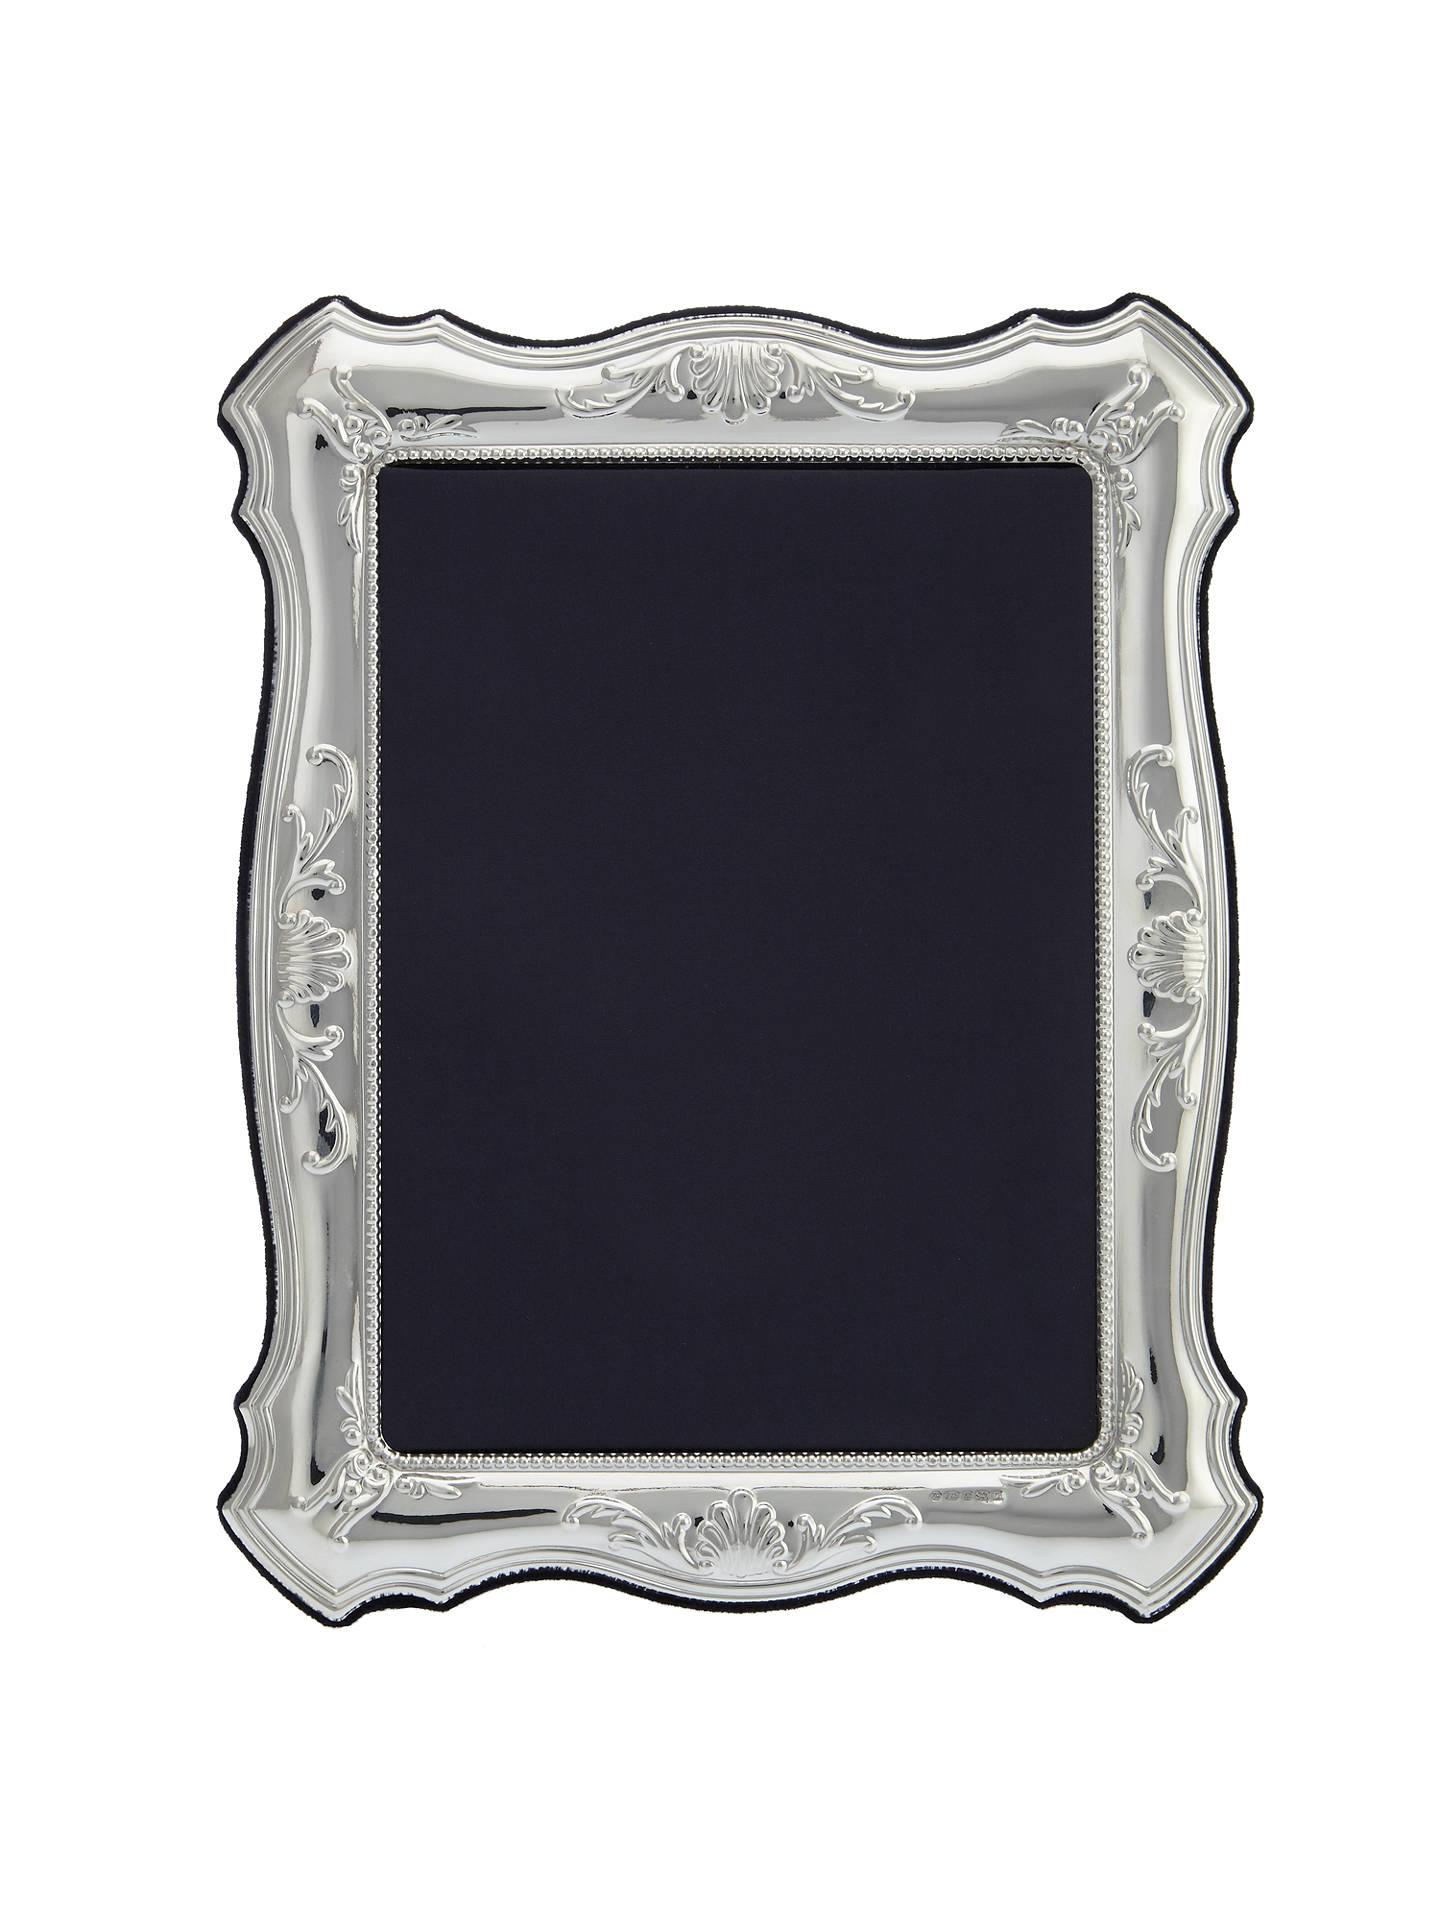 Carrs Vintage Sterling Silver Photo Frame 7 X 5 At John Lewis